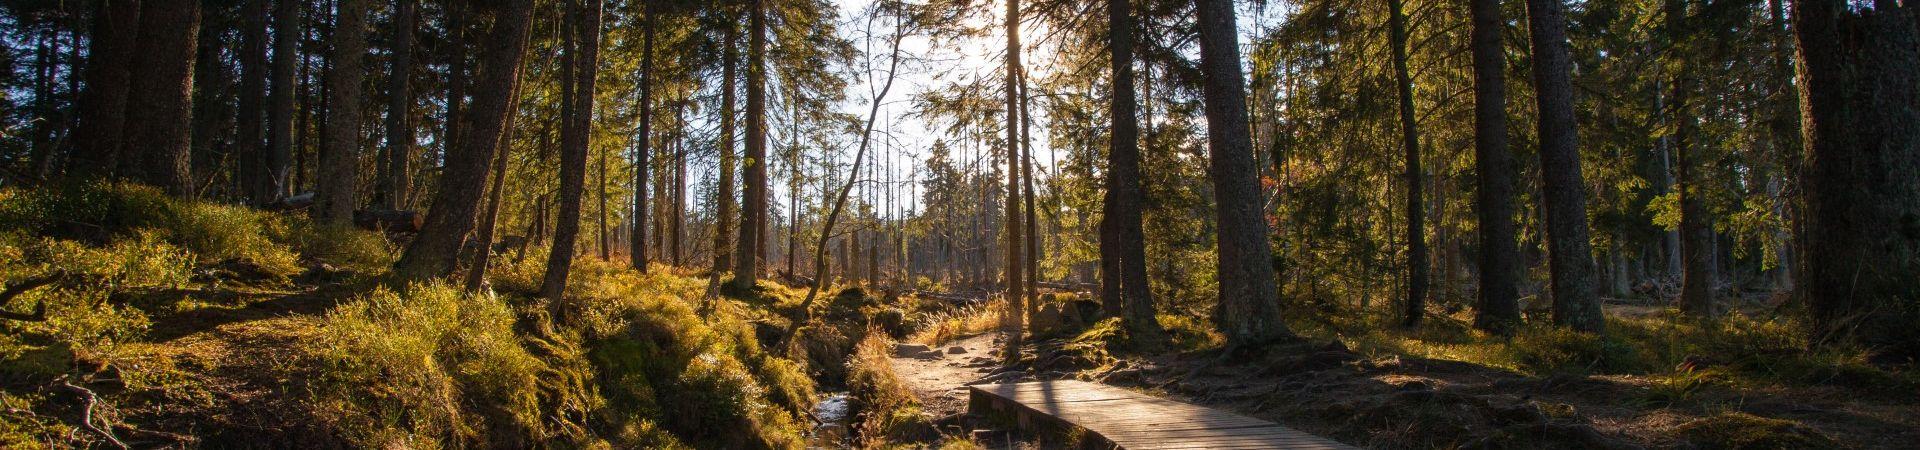 Wellnesshotels im Harz